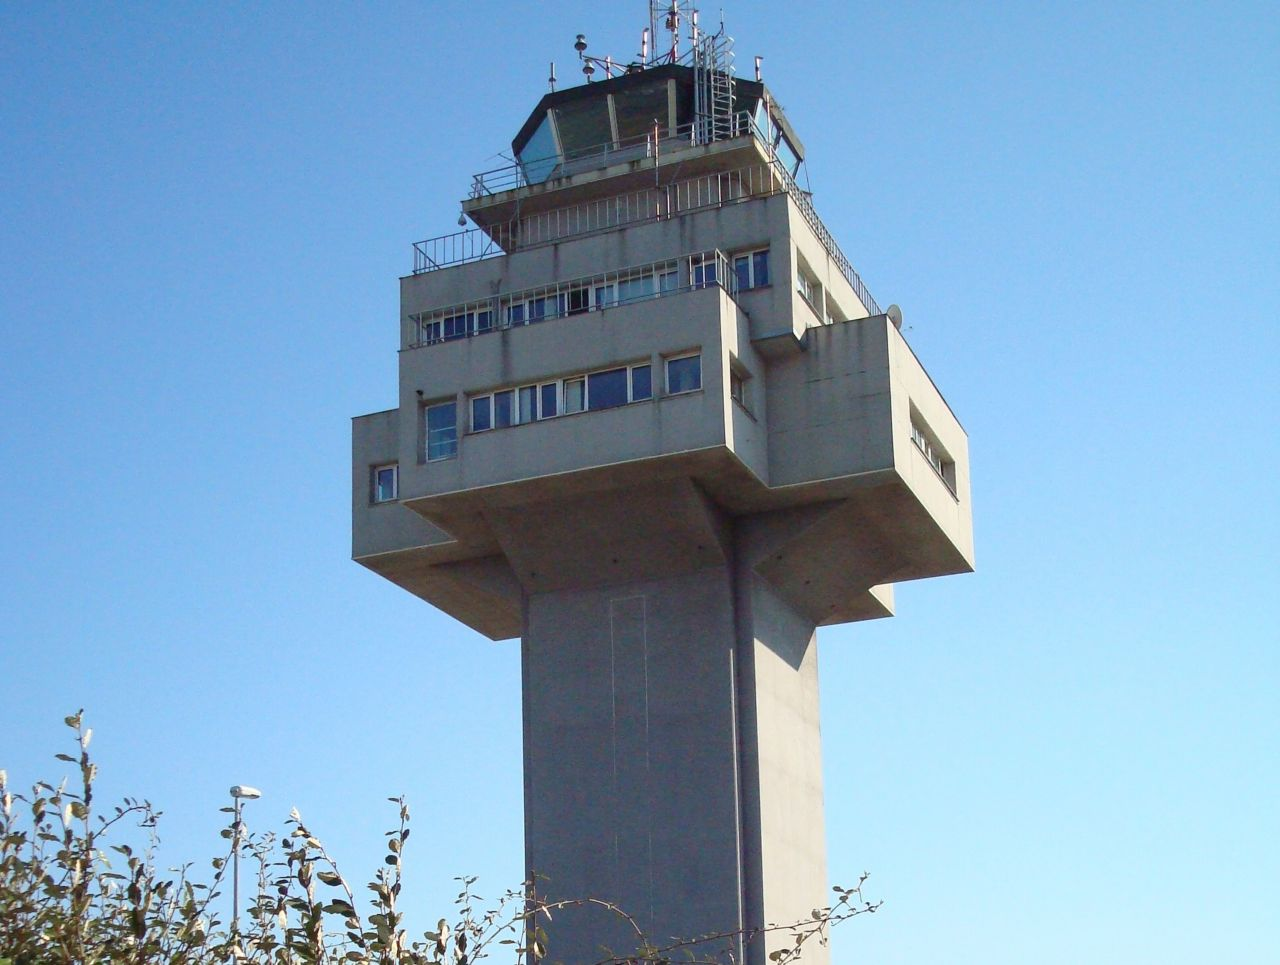 Control tower in Santander Airport